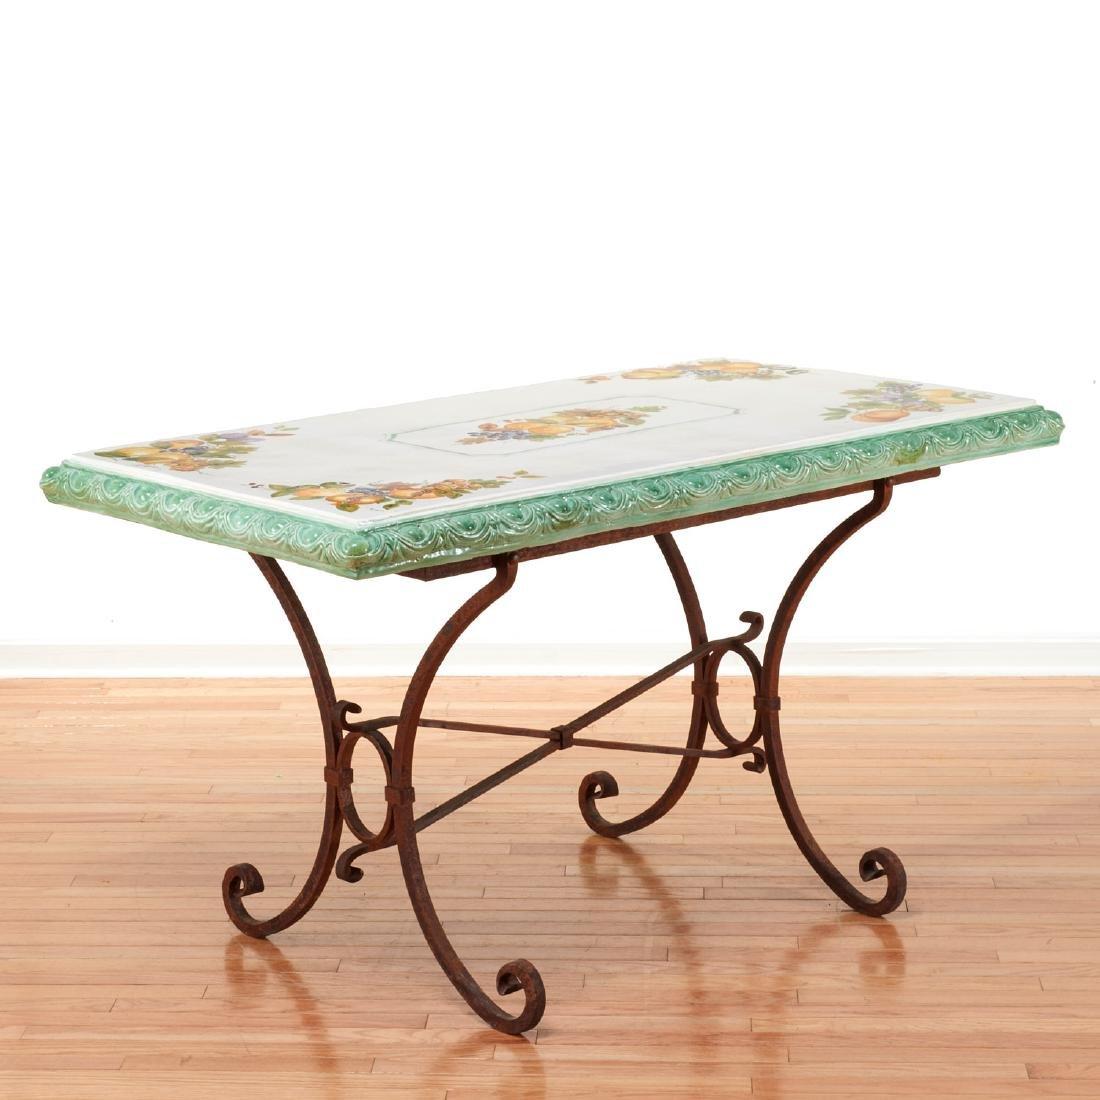 Italian iron and majolica garden table